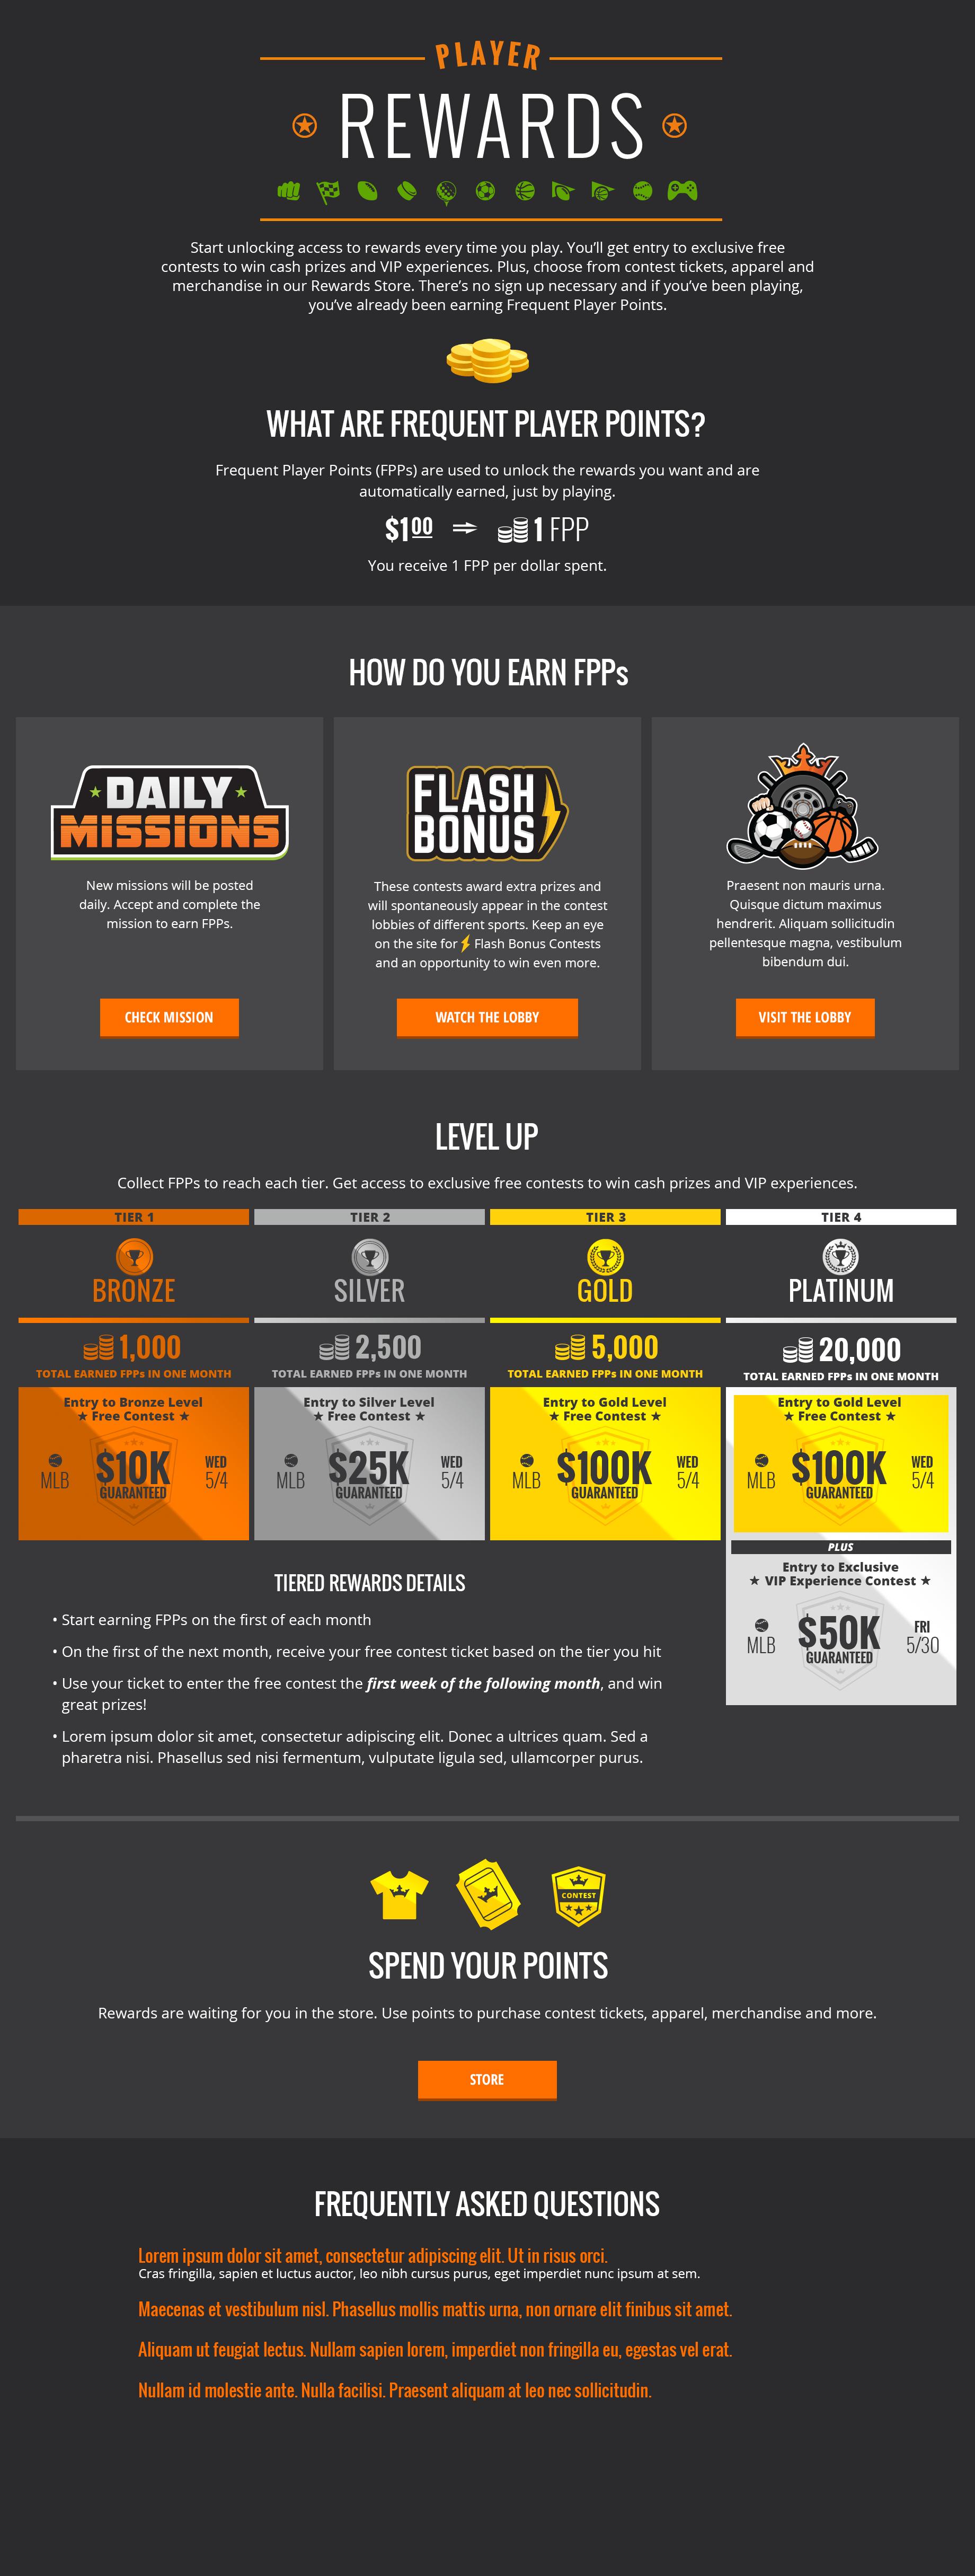 Loyalty-Rewards-Promo-Page_R4.3.png